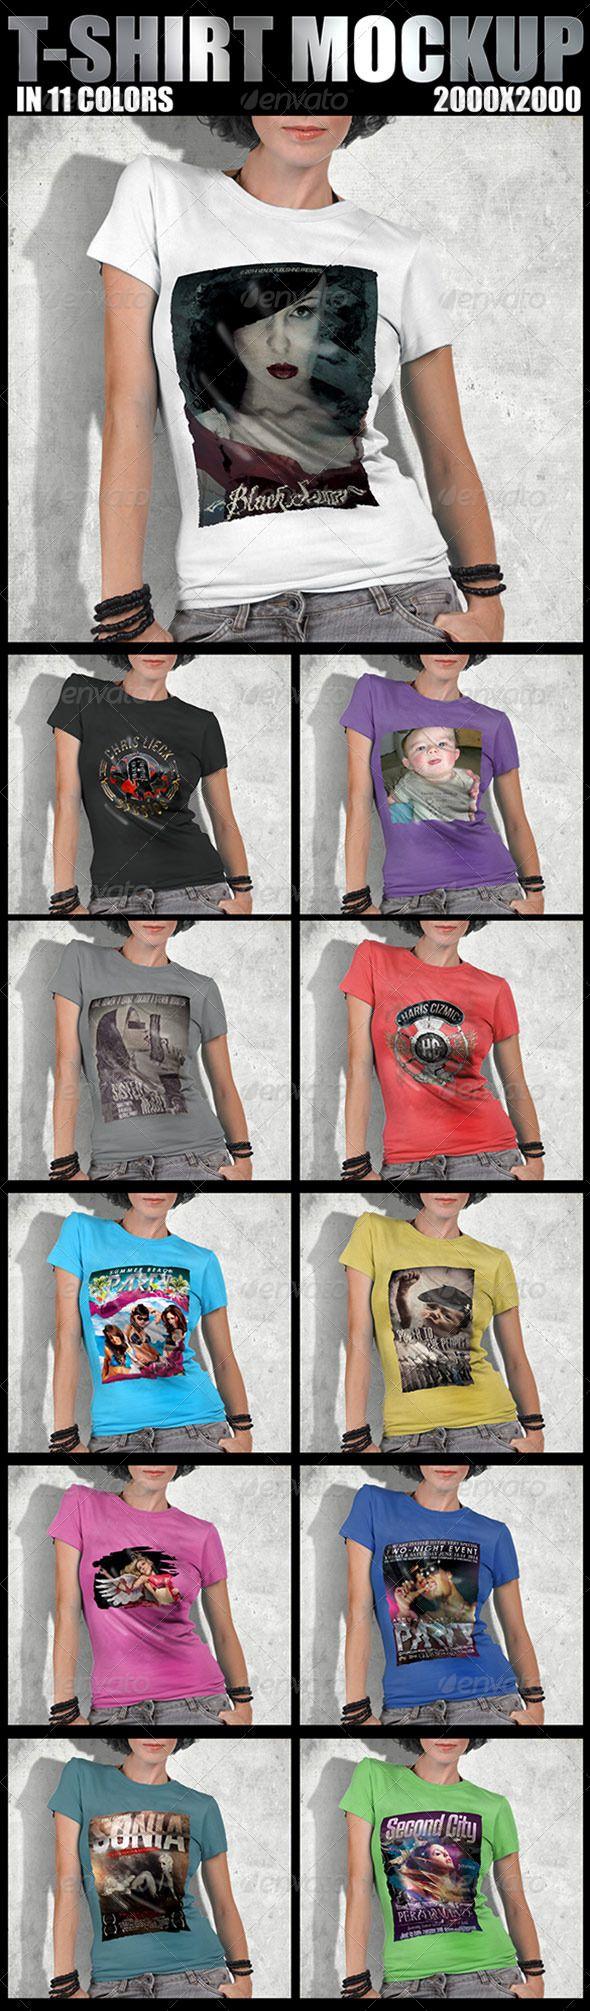 Shirt design photoshop template - T Shirt Mockup Design